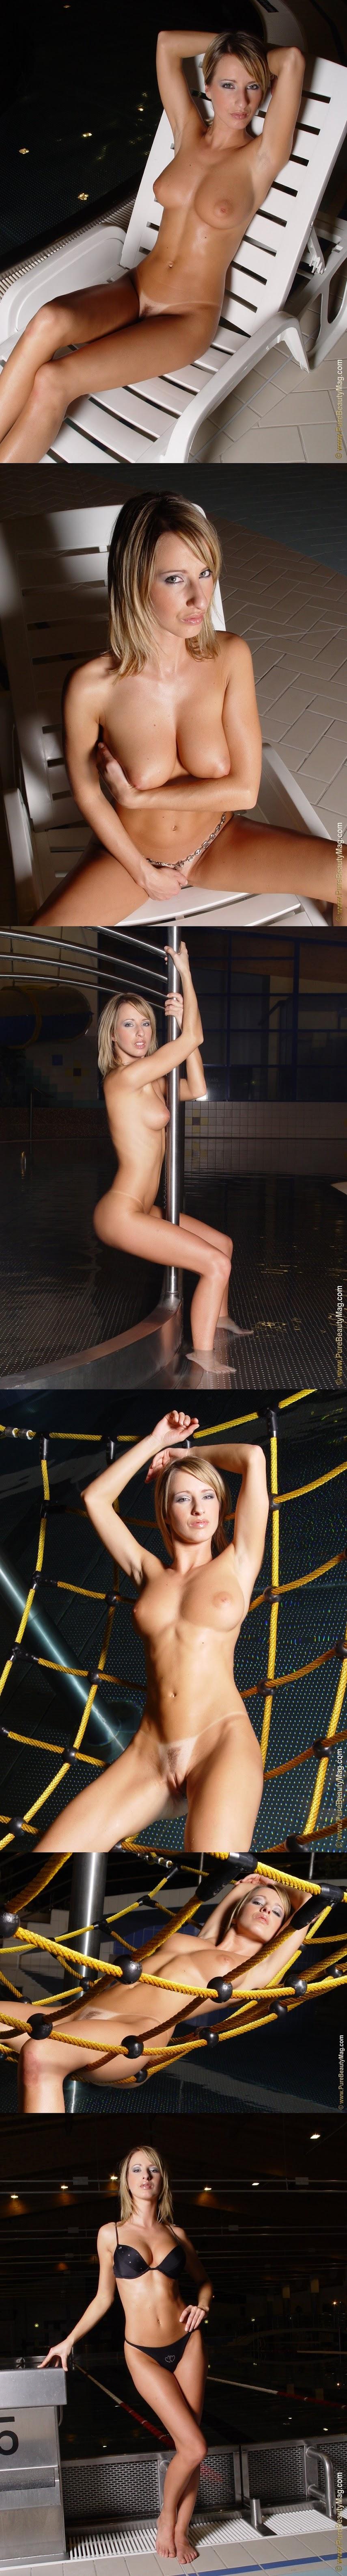 PureBeautyMag PBM  - 2005-09-09 -  s116902 - Katerina Milfait - Temptation - 2560px